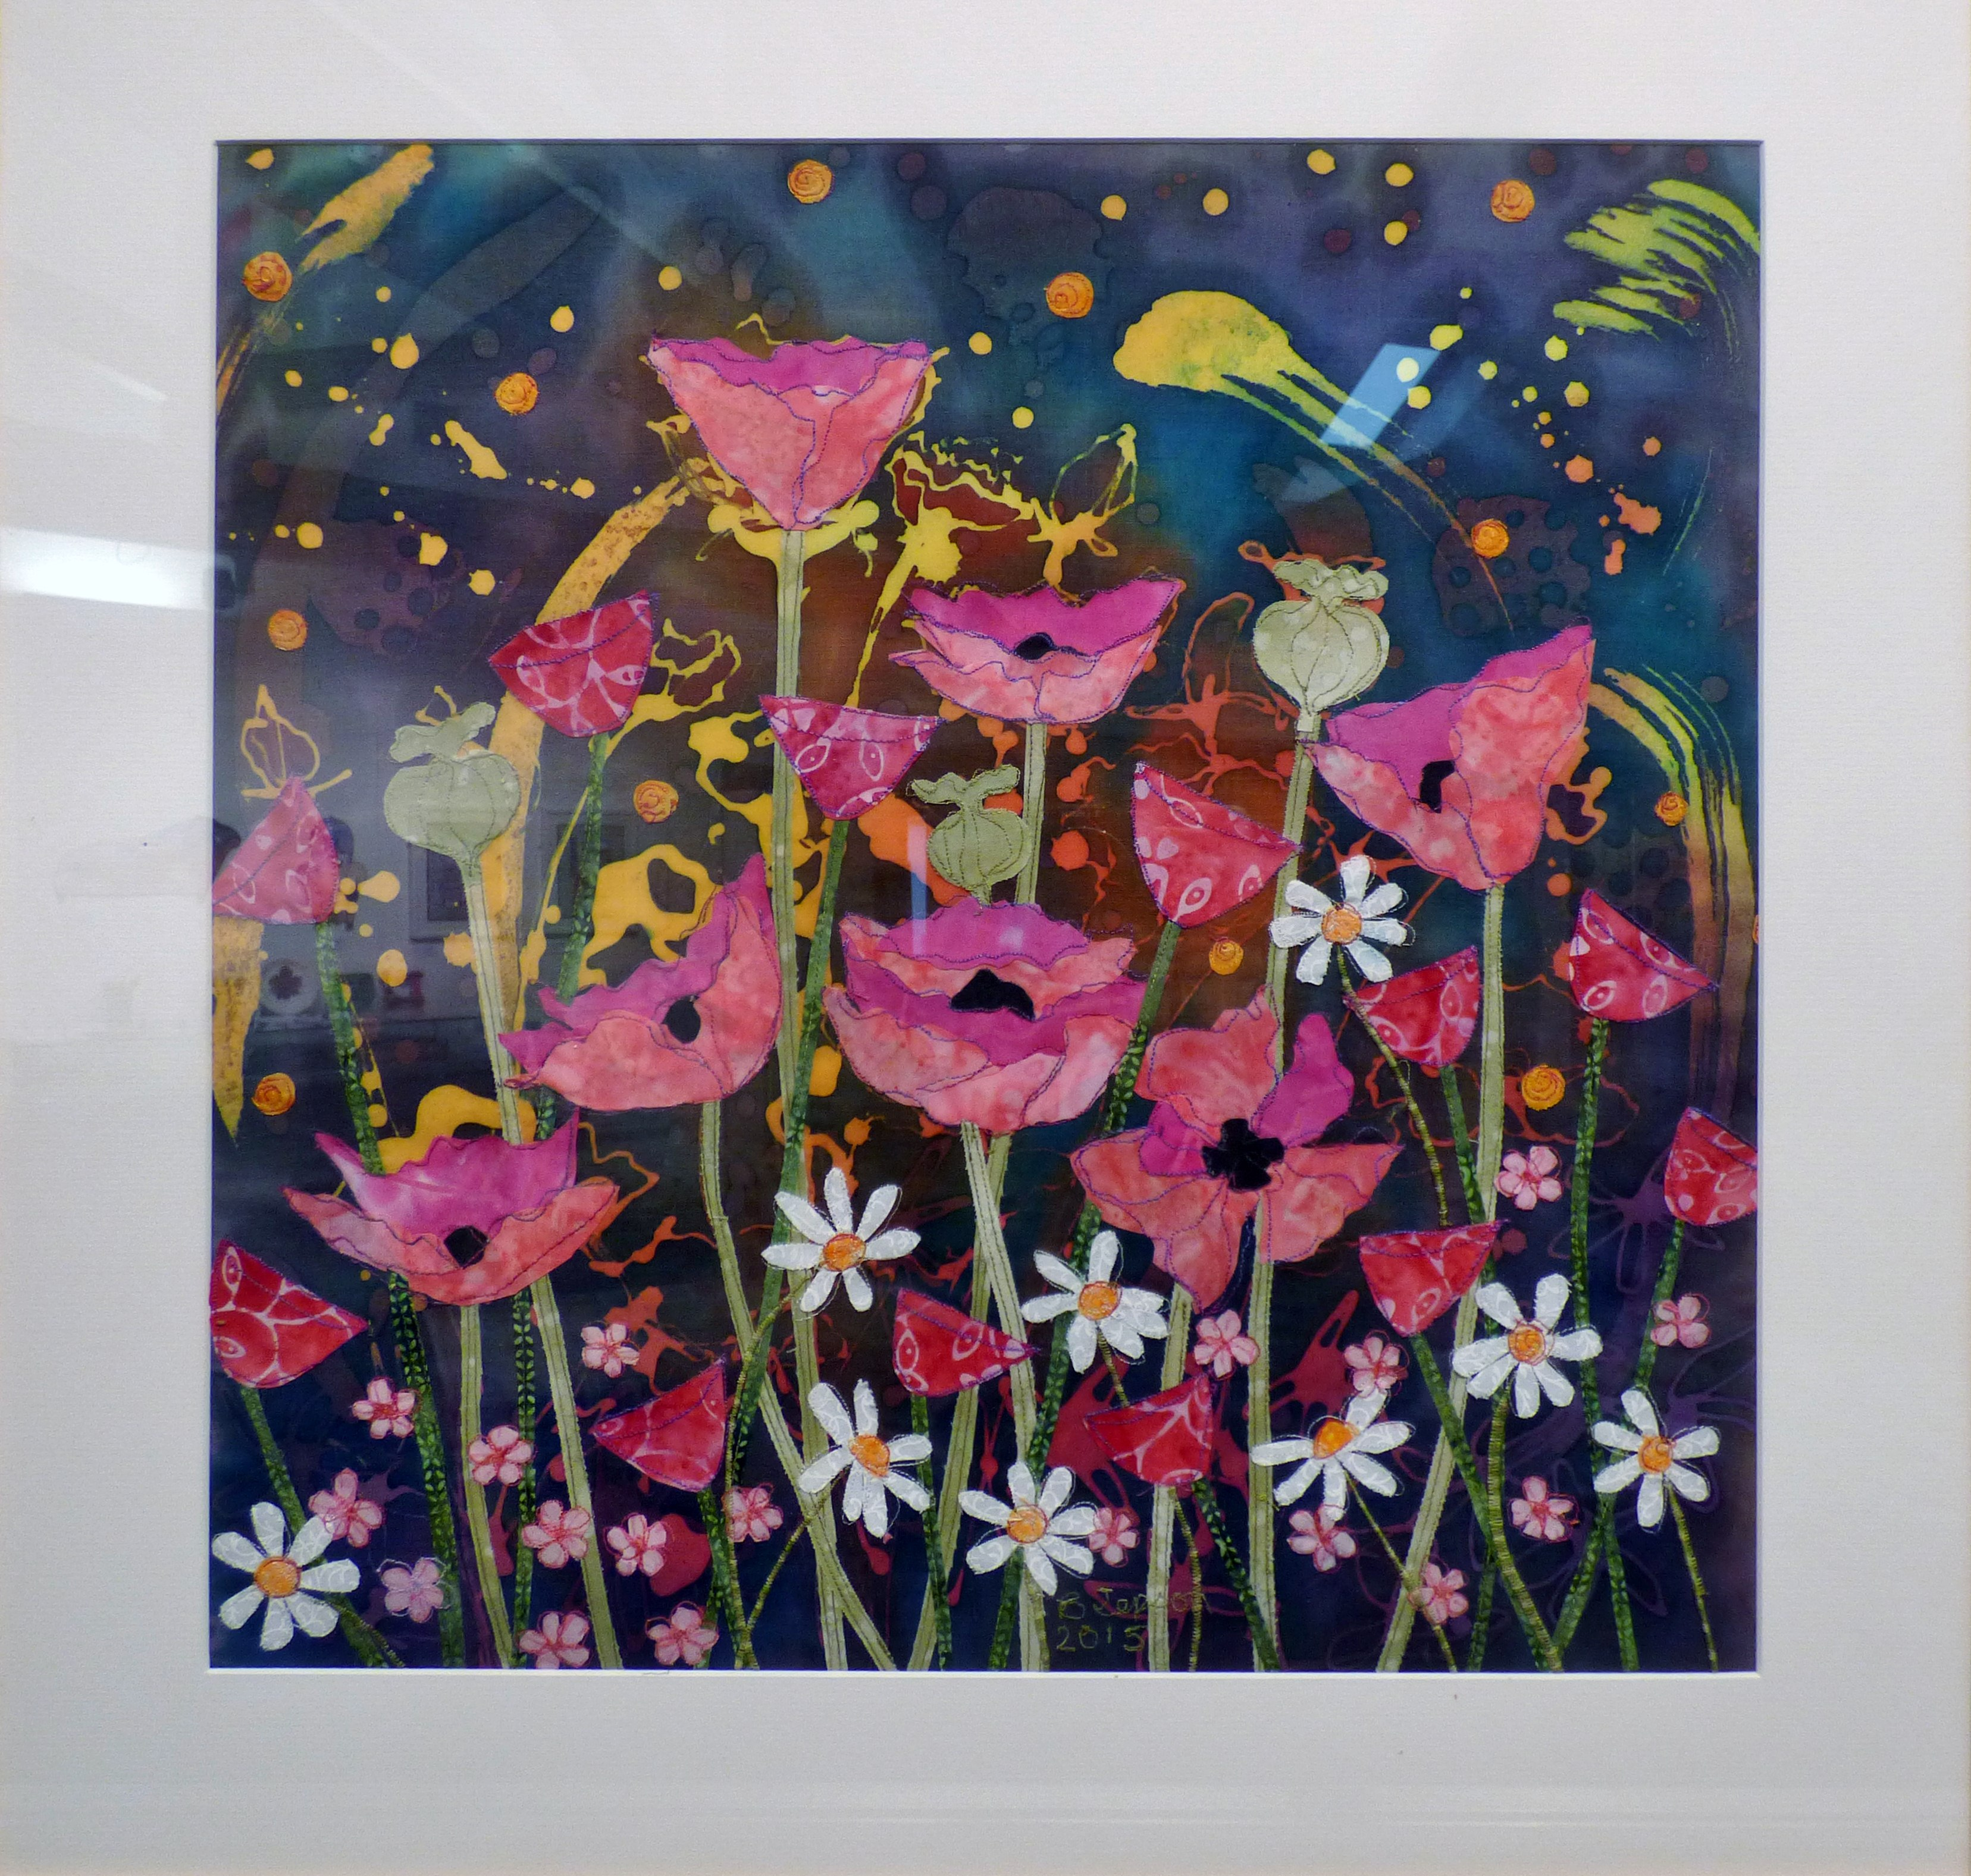 IN THE PINK by Barbara Jepson, Ten Plus exhibition, Nantwich